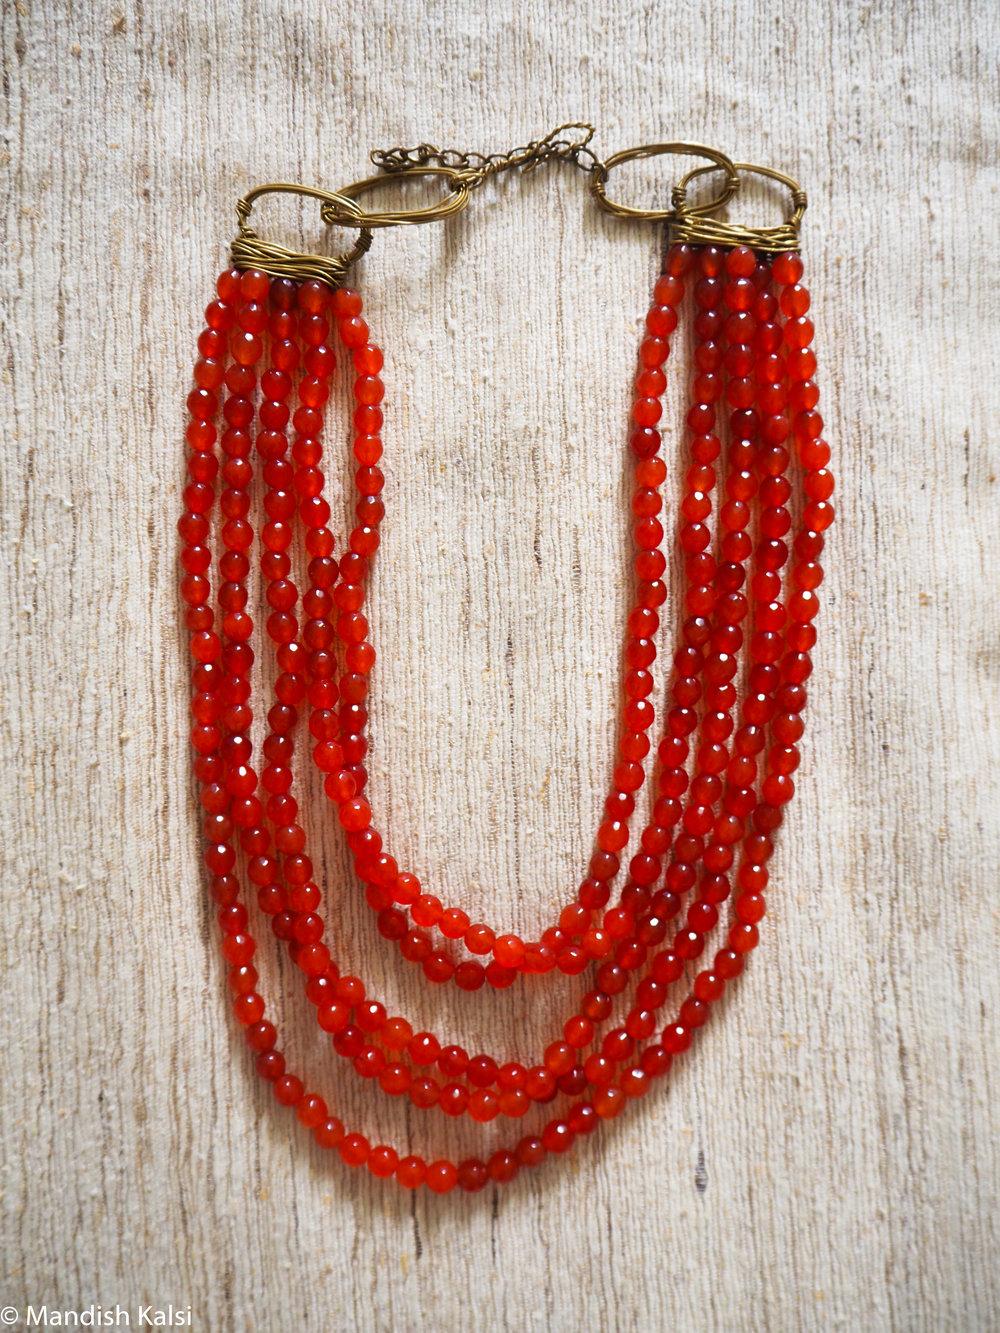 Edana necklace  Layered Carnelian beads.